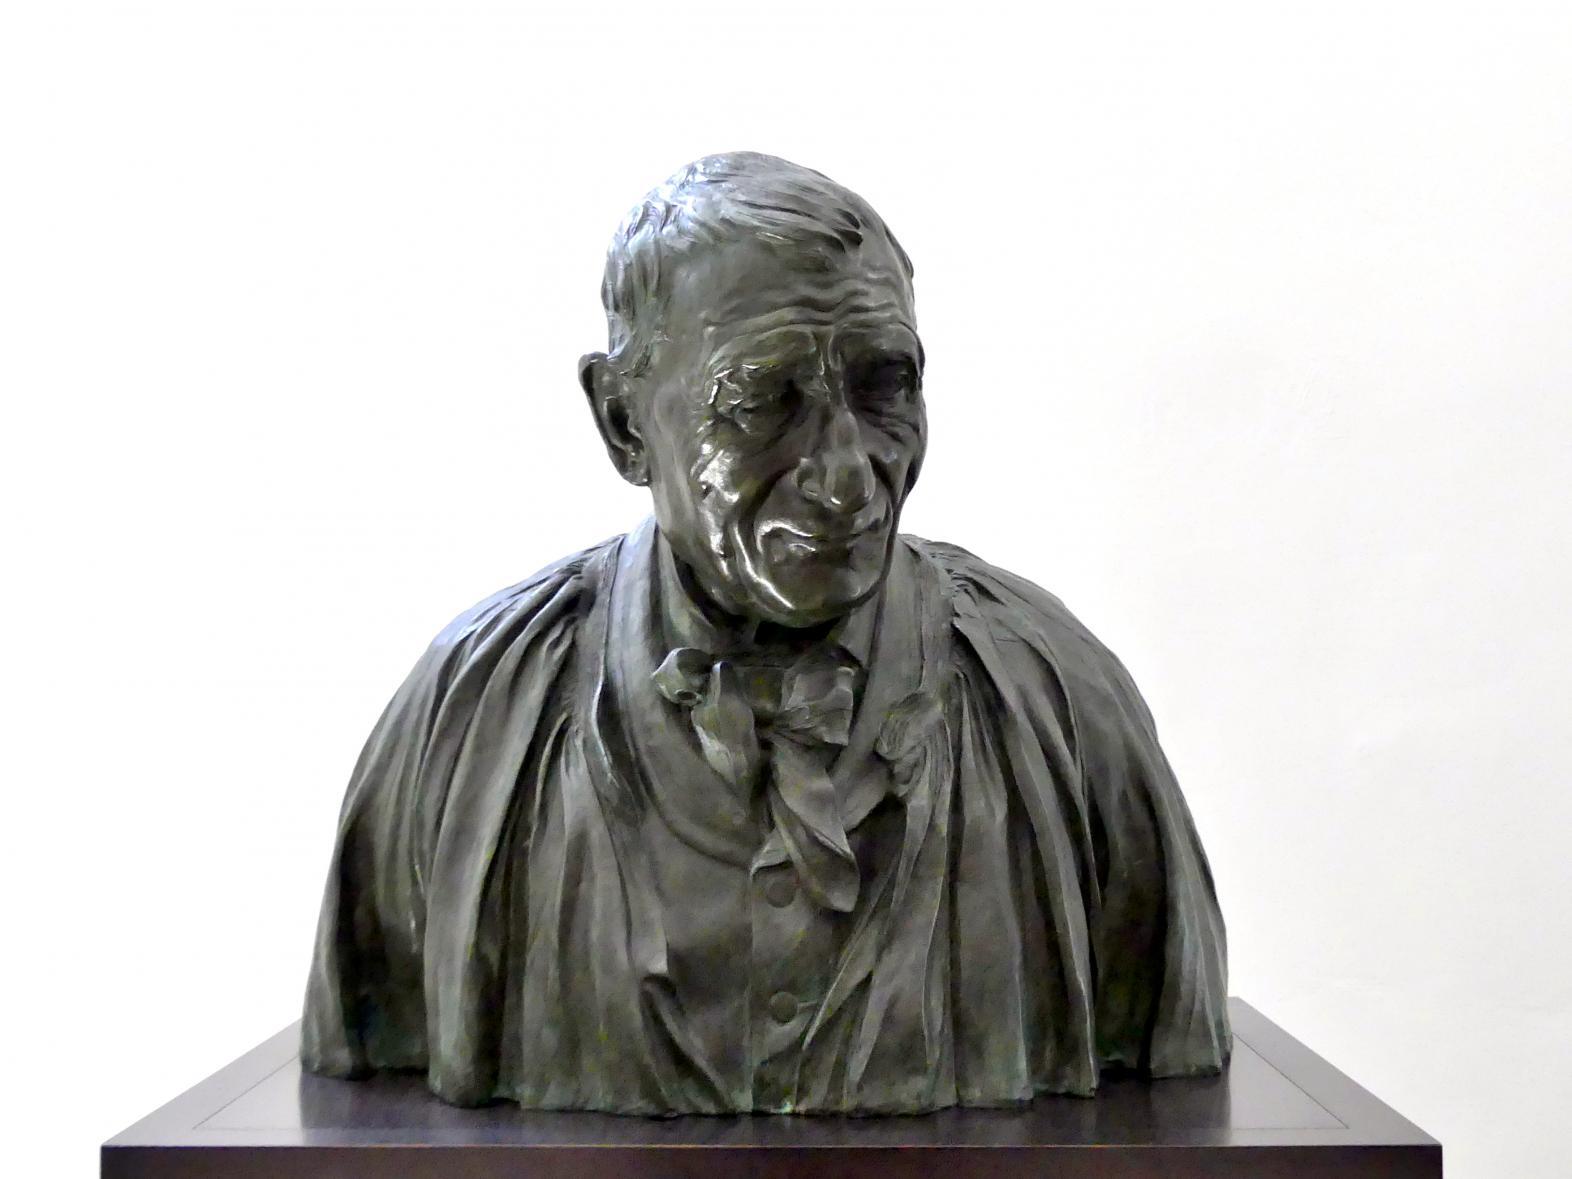 Aimé-Jules Dalou: Der Pferdehändler, um 1890